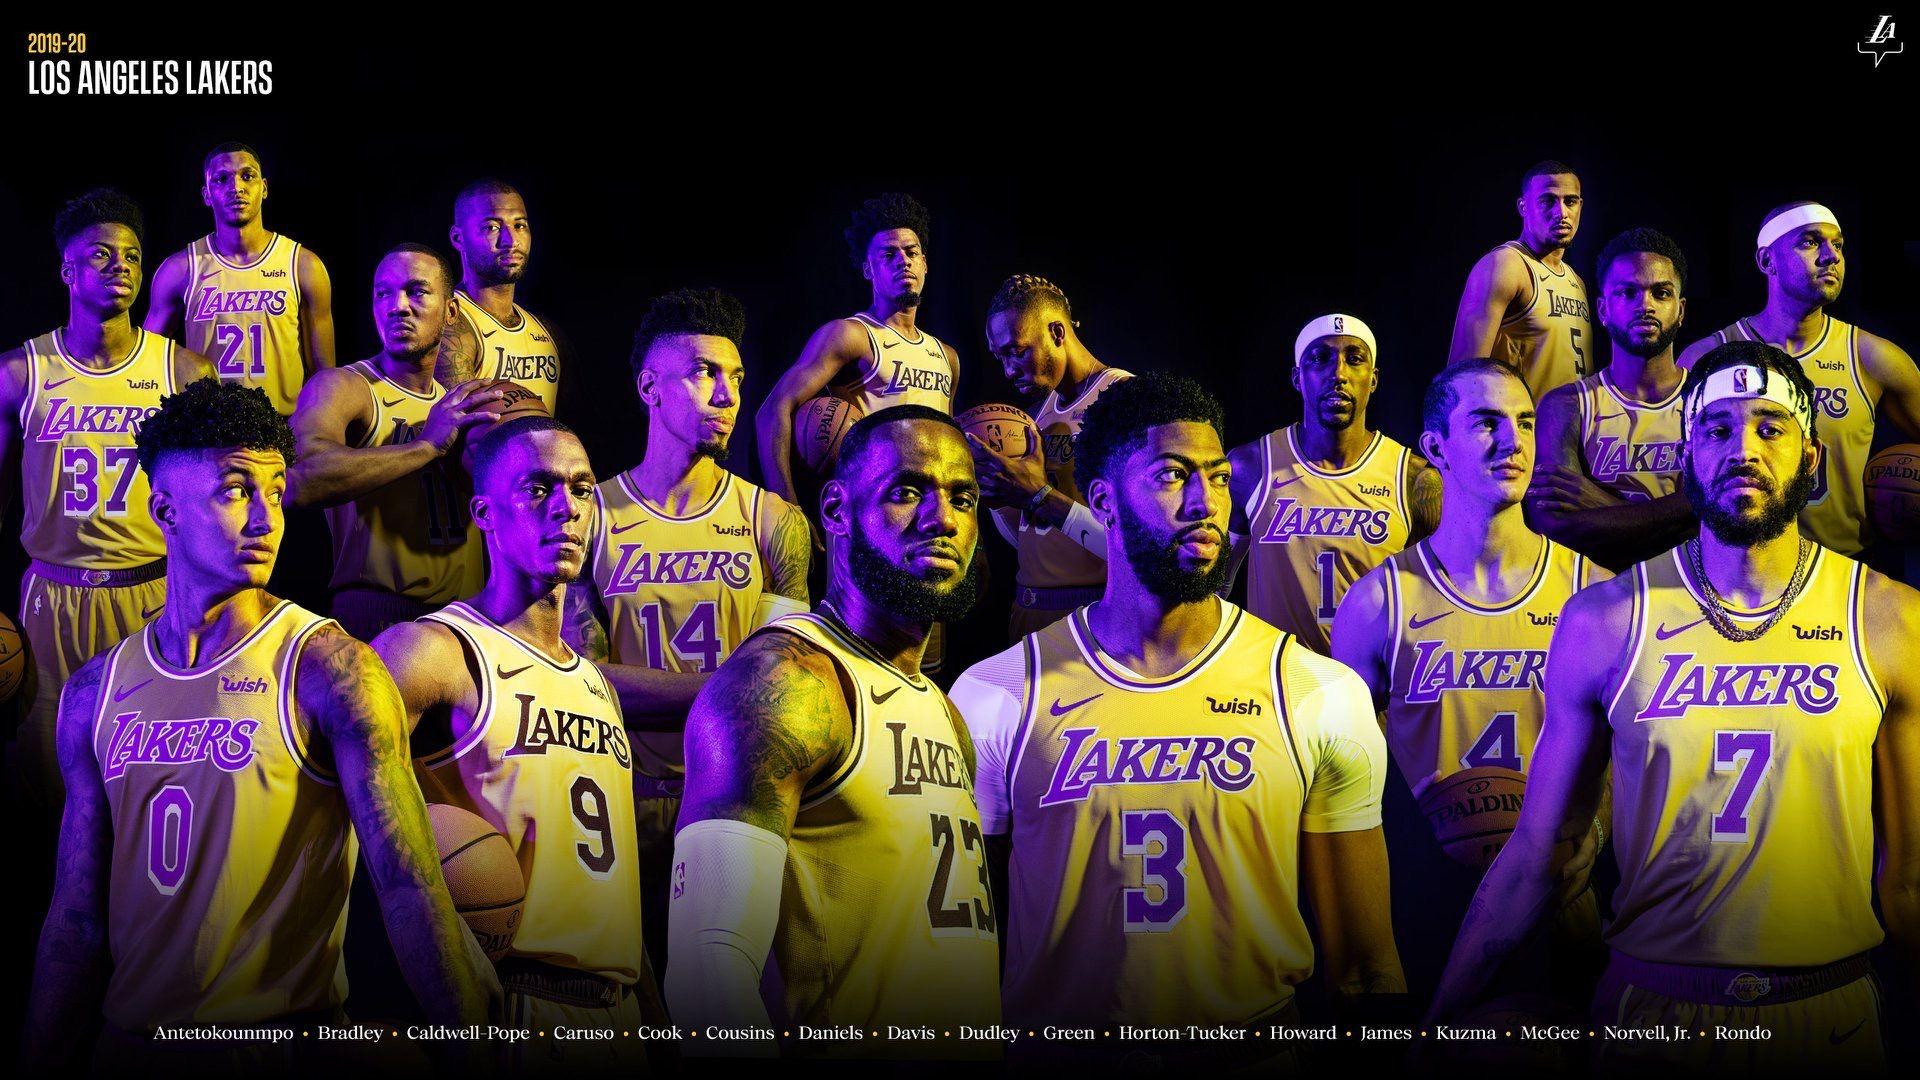 Los Angeles Lakers On Instagram We Re Back Introducing Your 2019 20 Los Angeles Lakers Lakers Wallpaper Los Angeles Lakers Los Angeles Lakers Logo